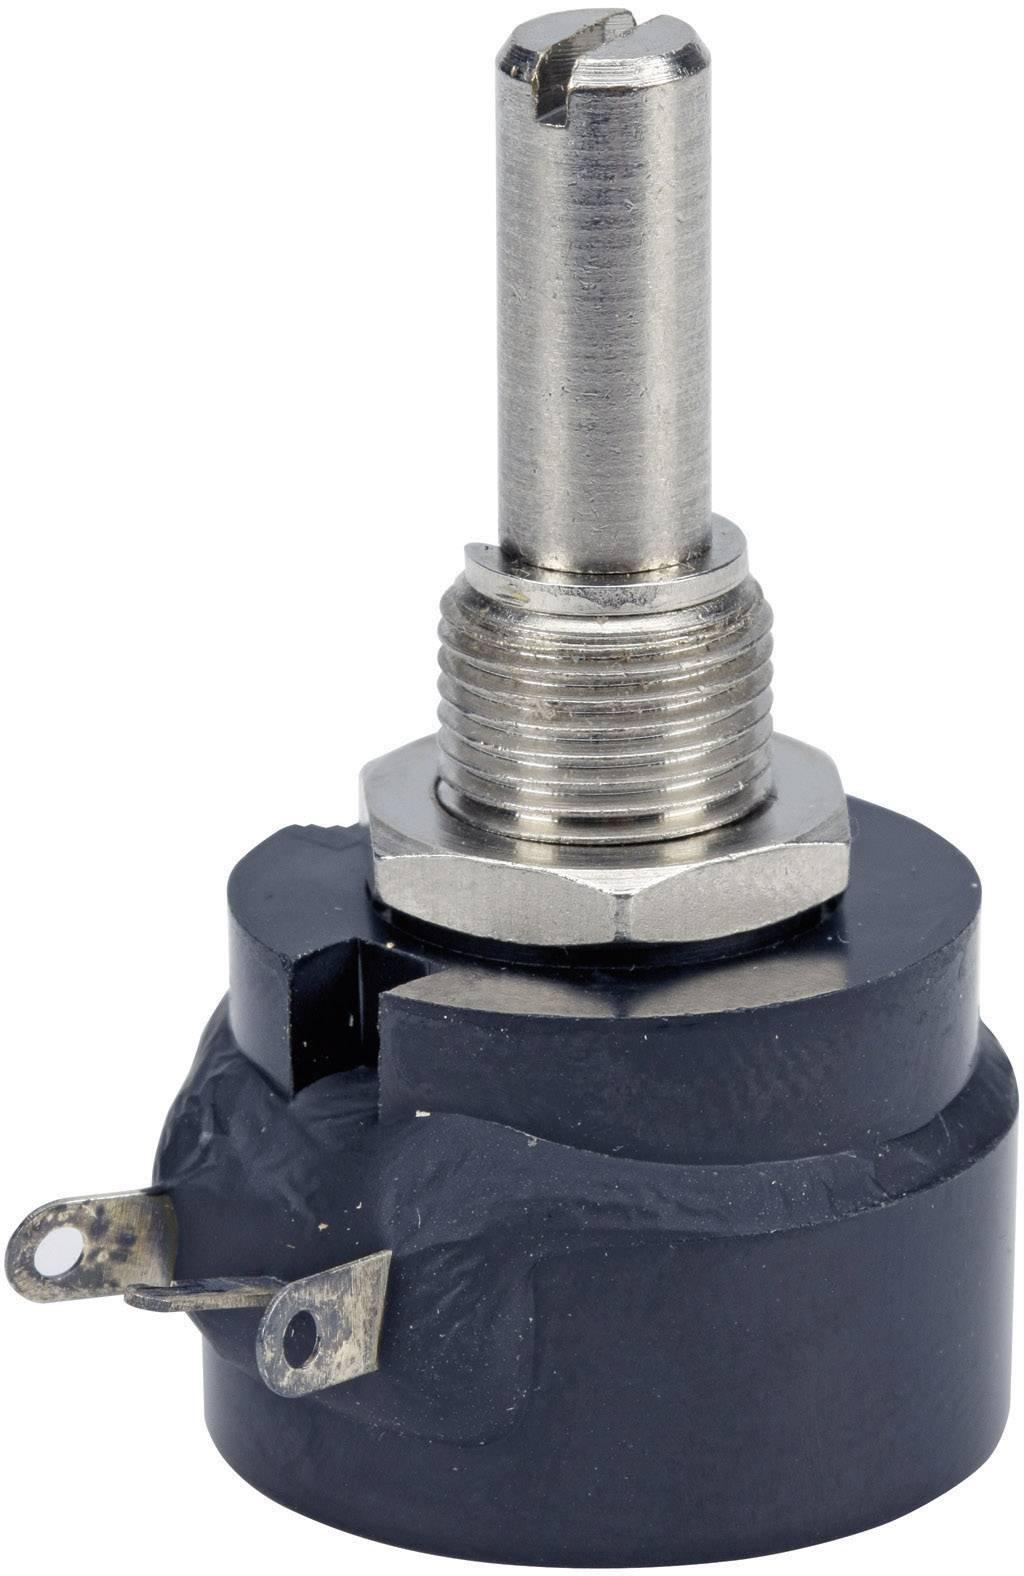 Drôtový potenciometer mono TT Electronics AB 3101206110 3101206110, 0.5 W, 100 Ohm, 1 ks